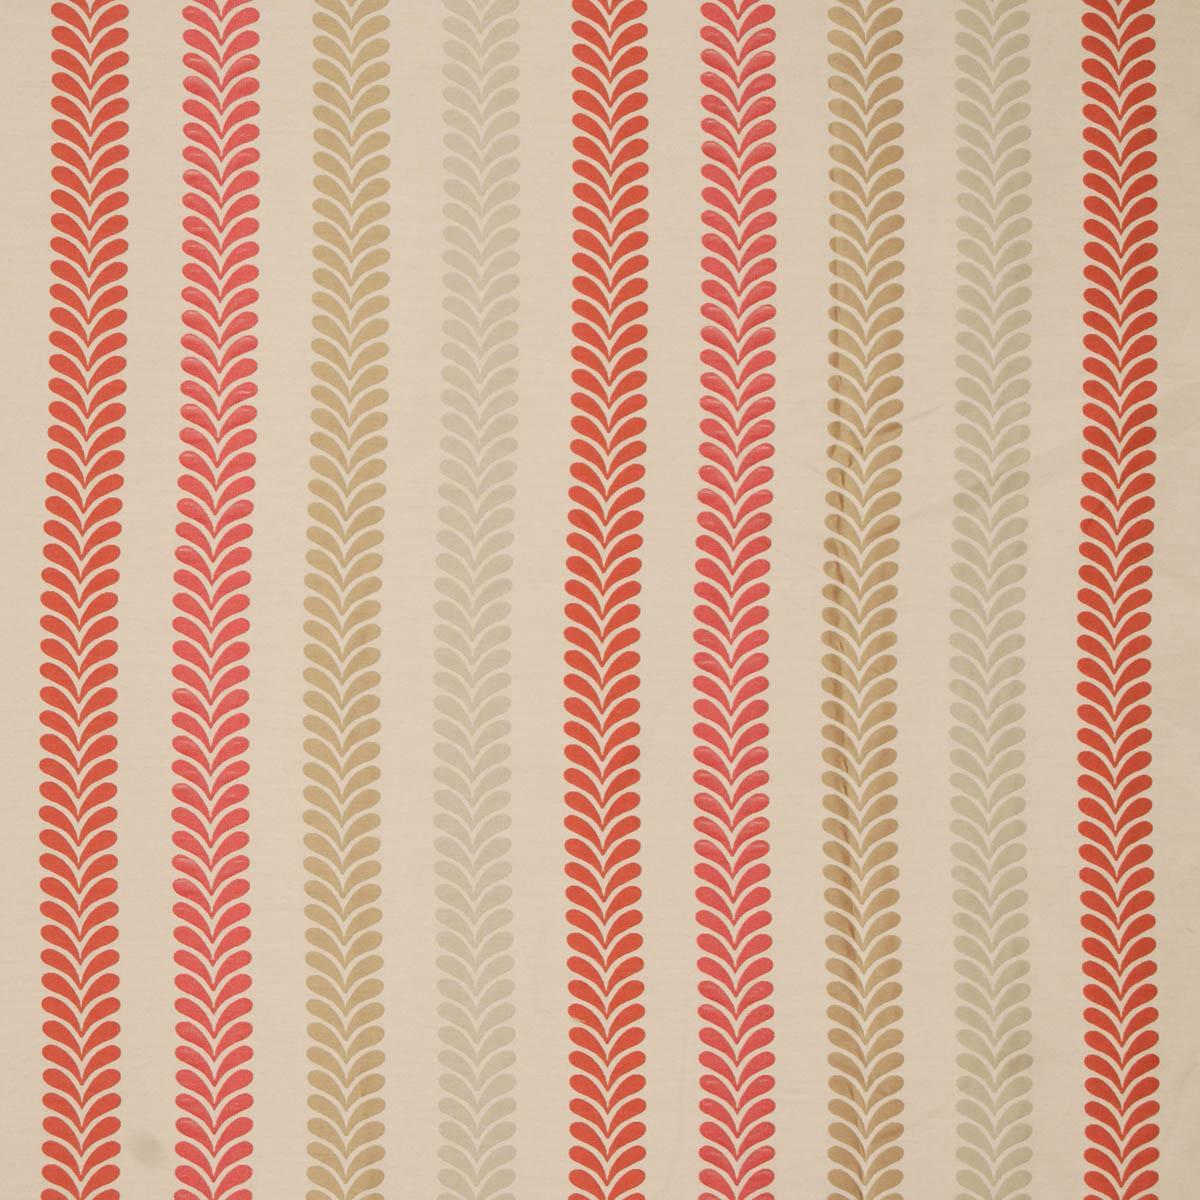 Napoli Curtain Fabric Cranberry Cheap Chenille Curtain Fabric